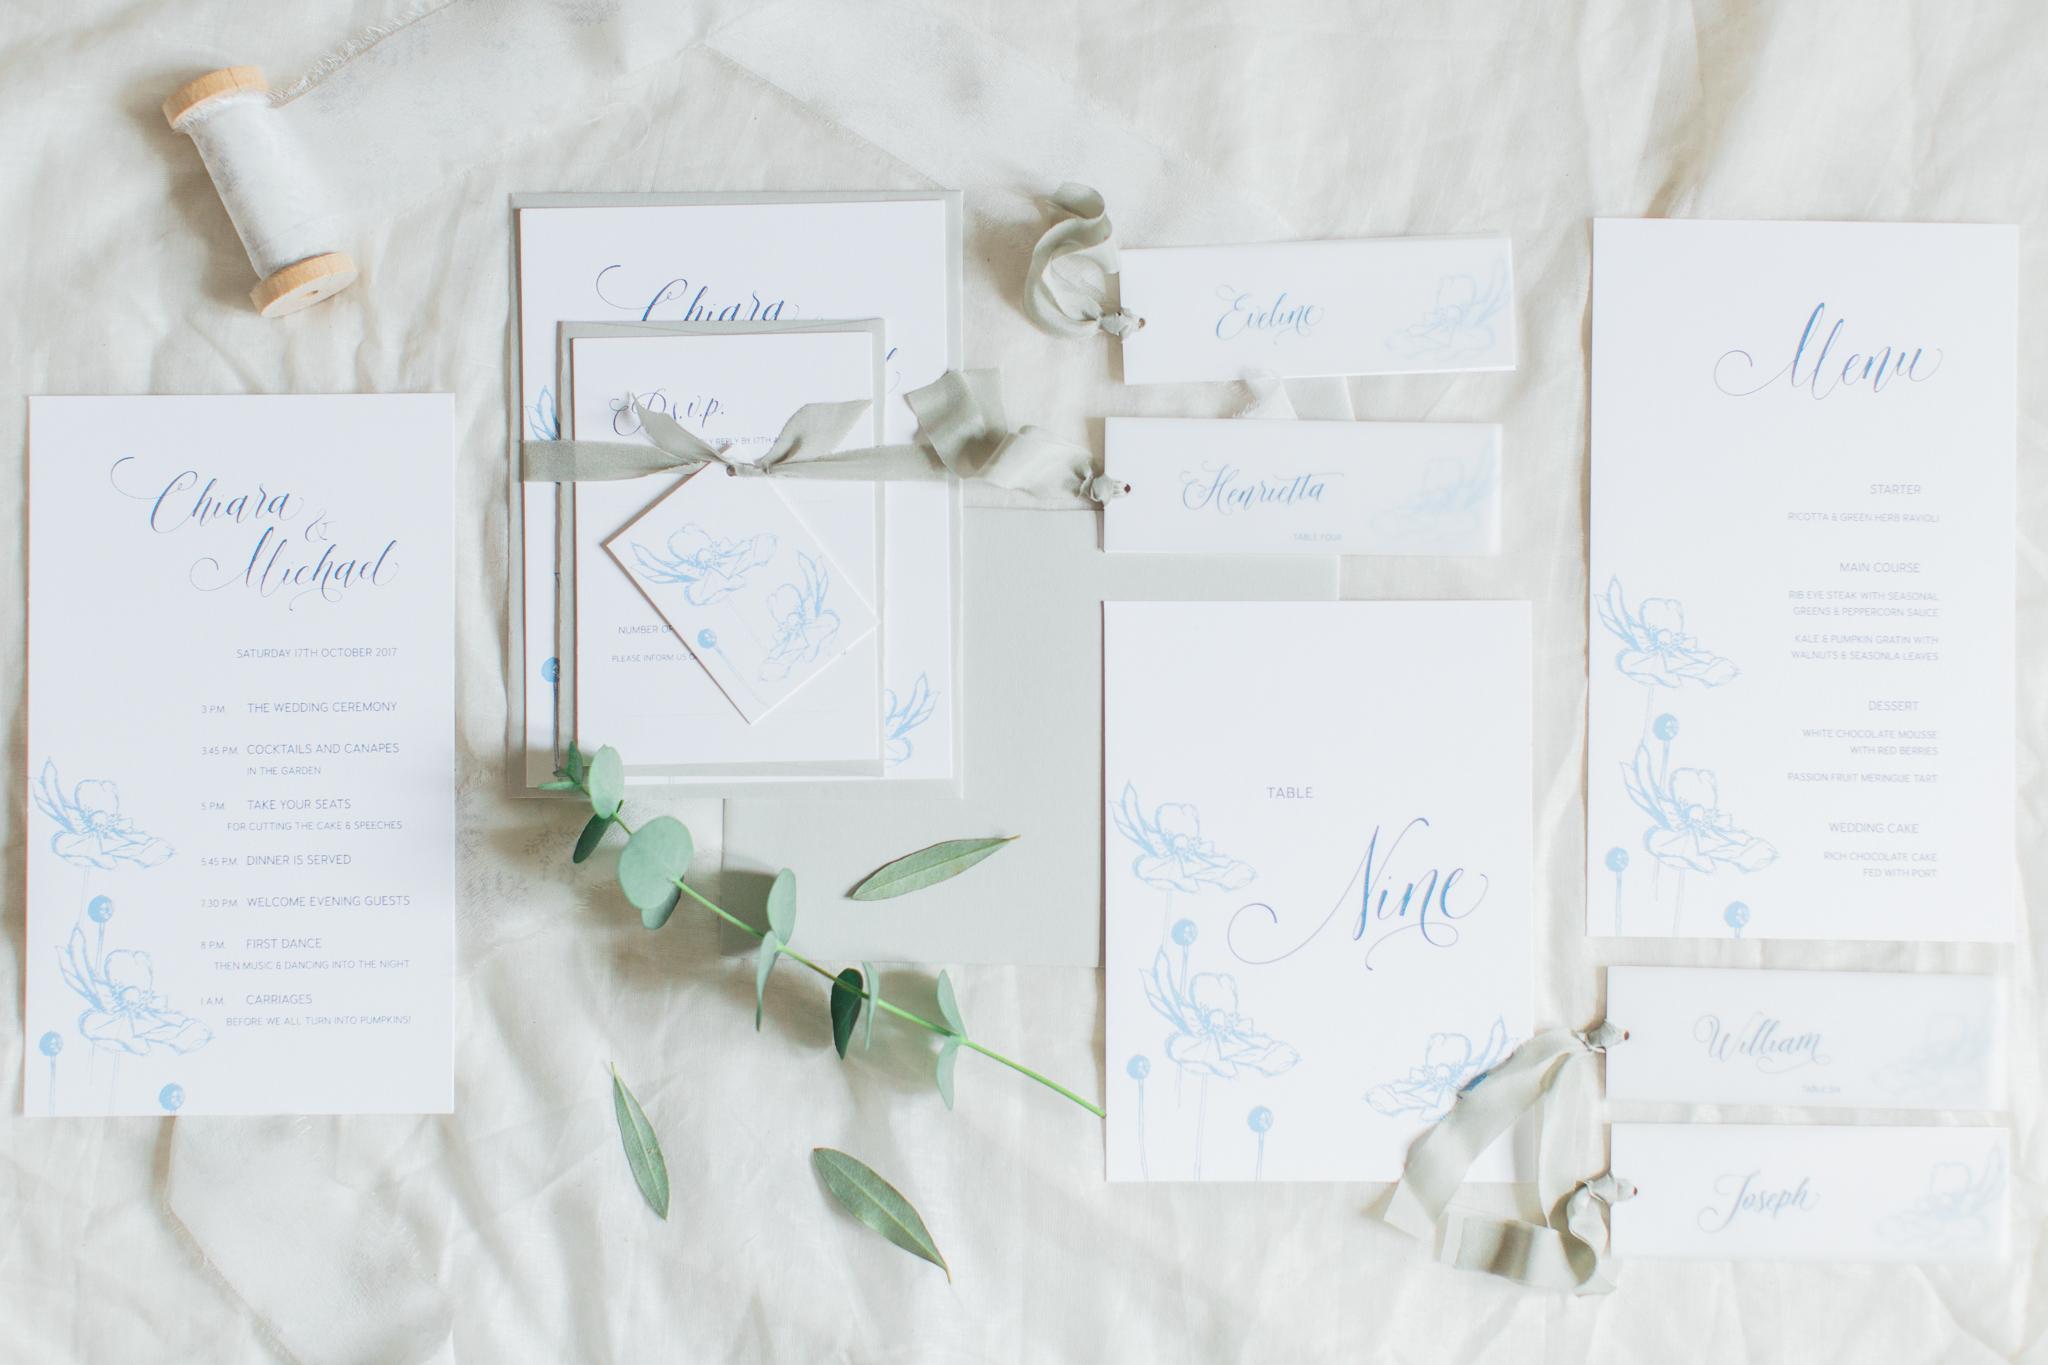 Inkflower Press Anemone silkscreen printed wedding stationery - Copenhagen Blue